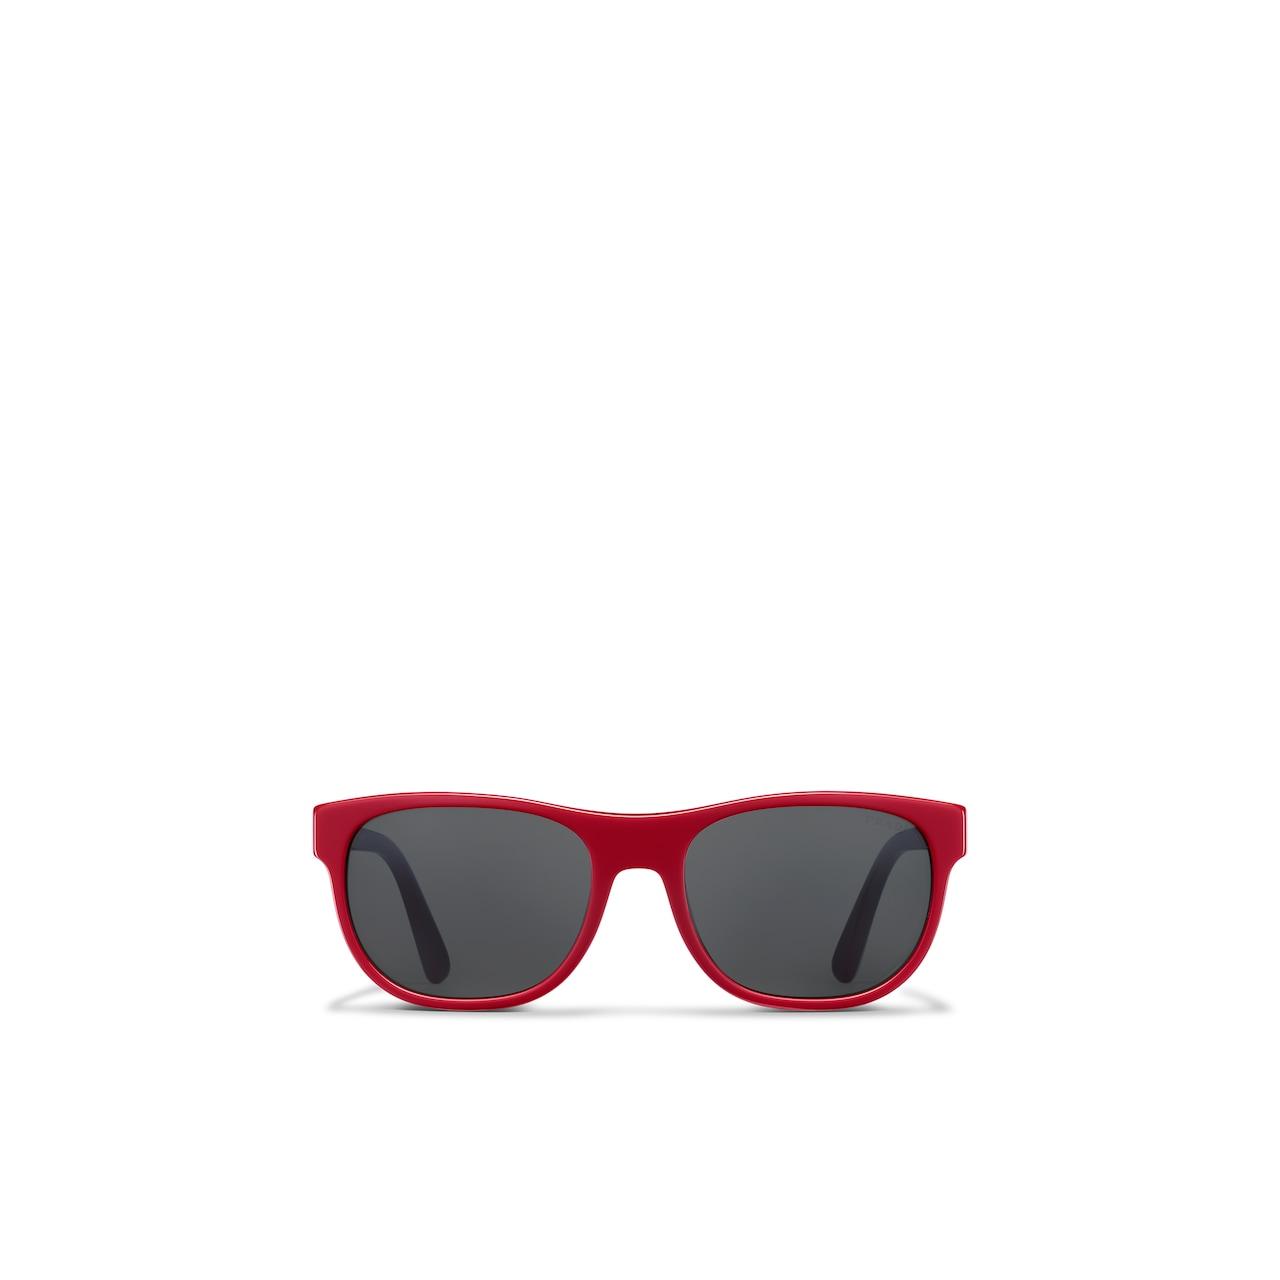 Prada Prada Eyewear Collection sunglasses 1